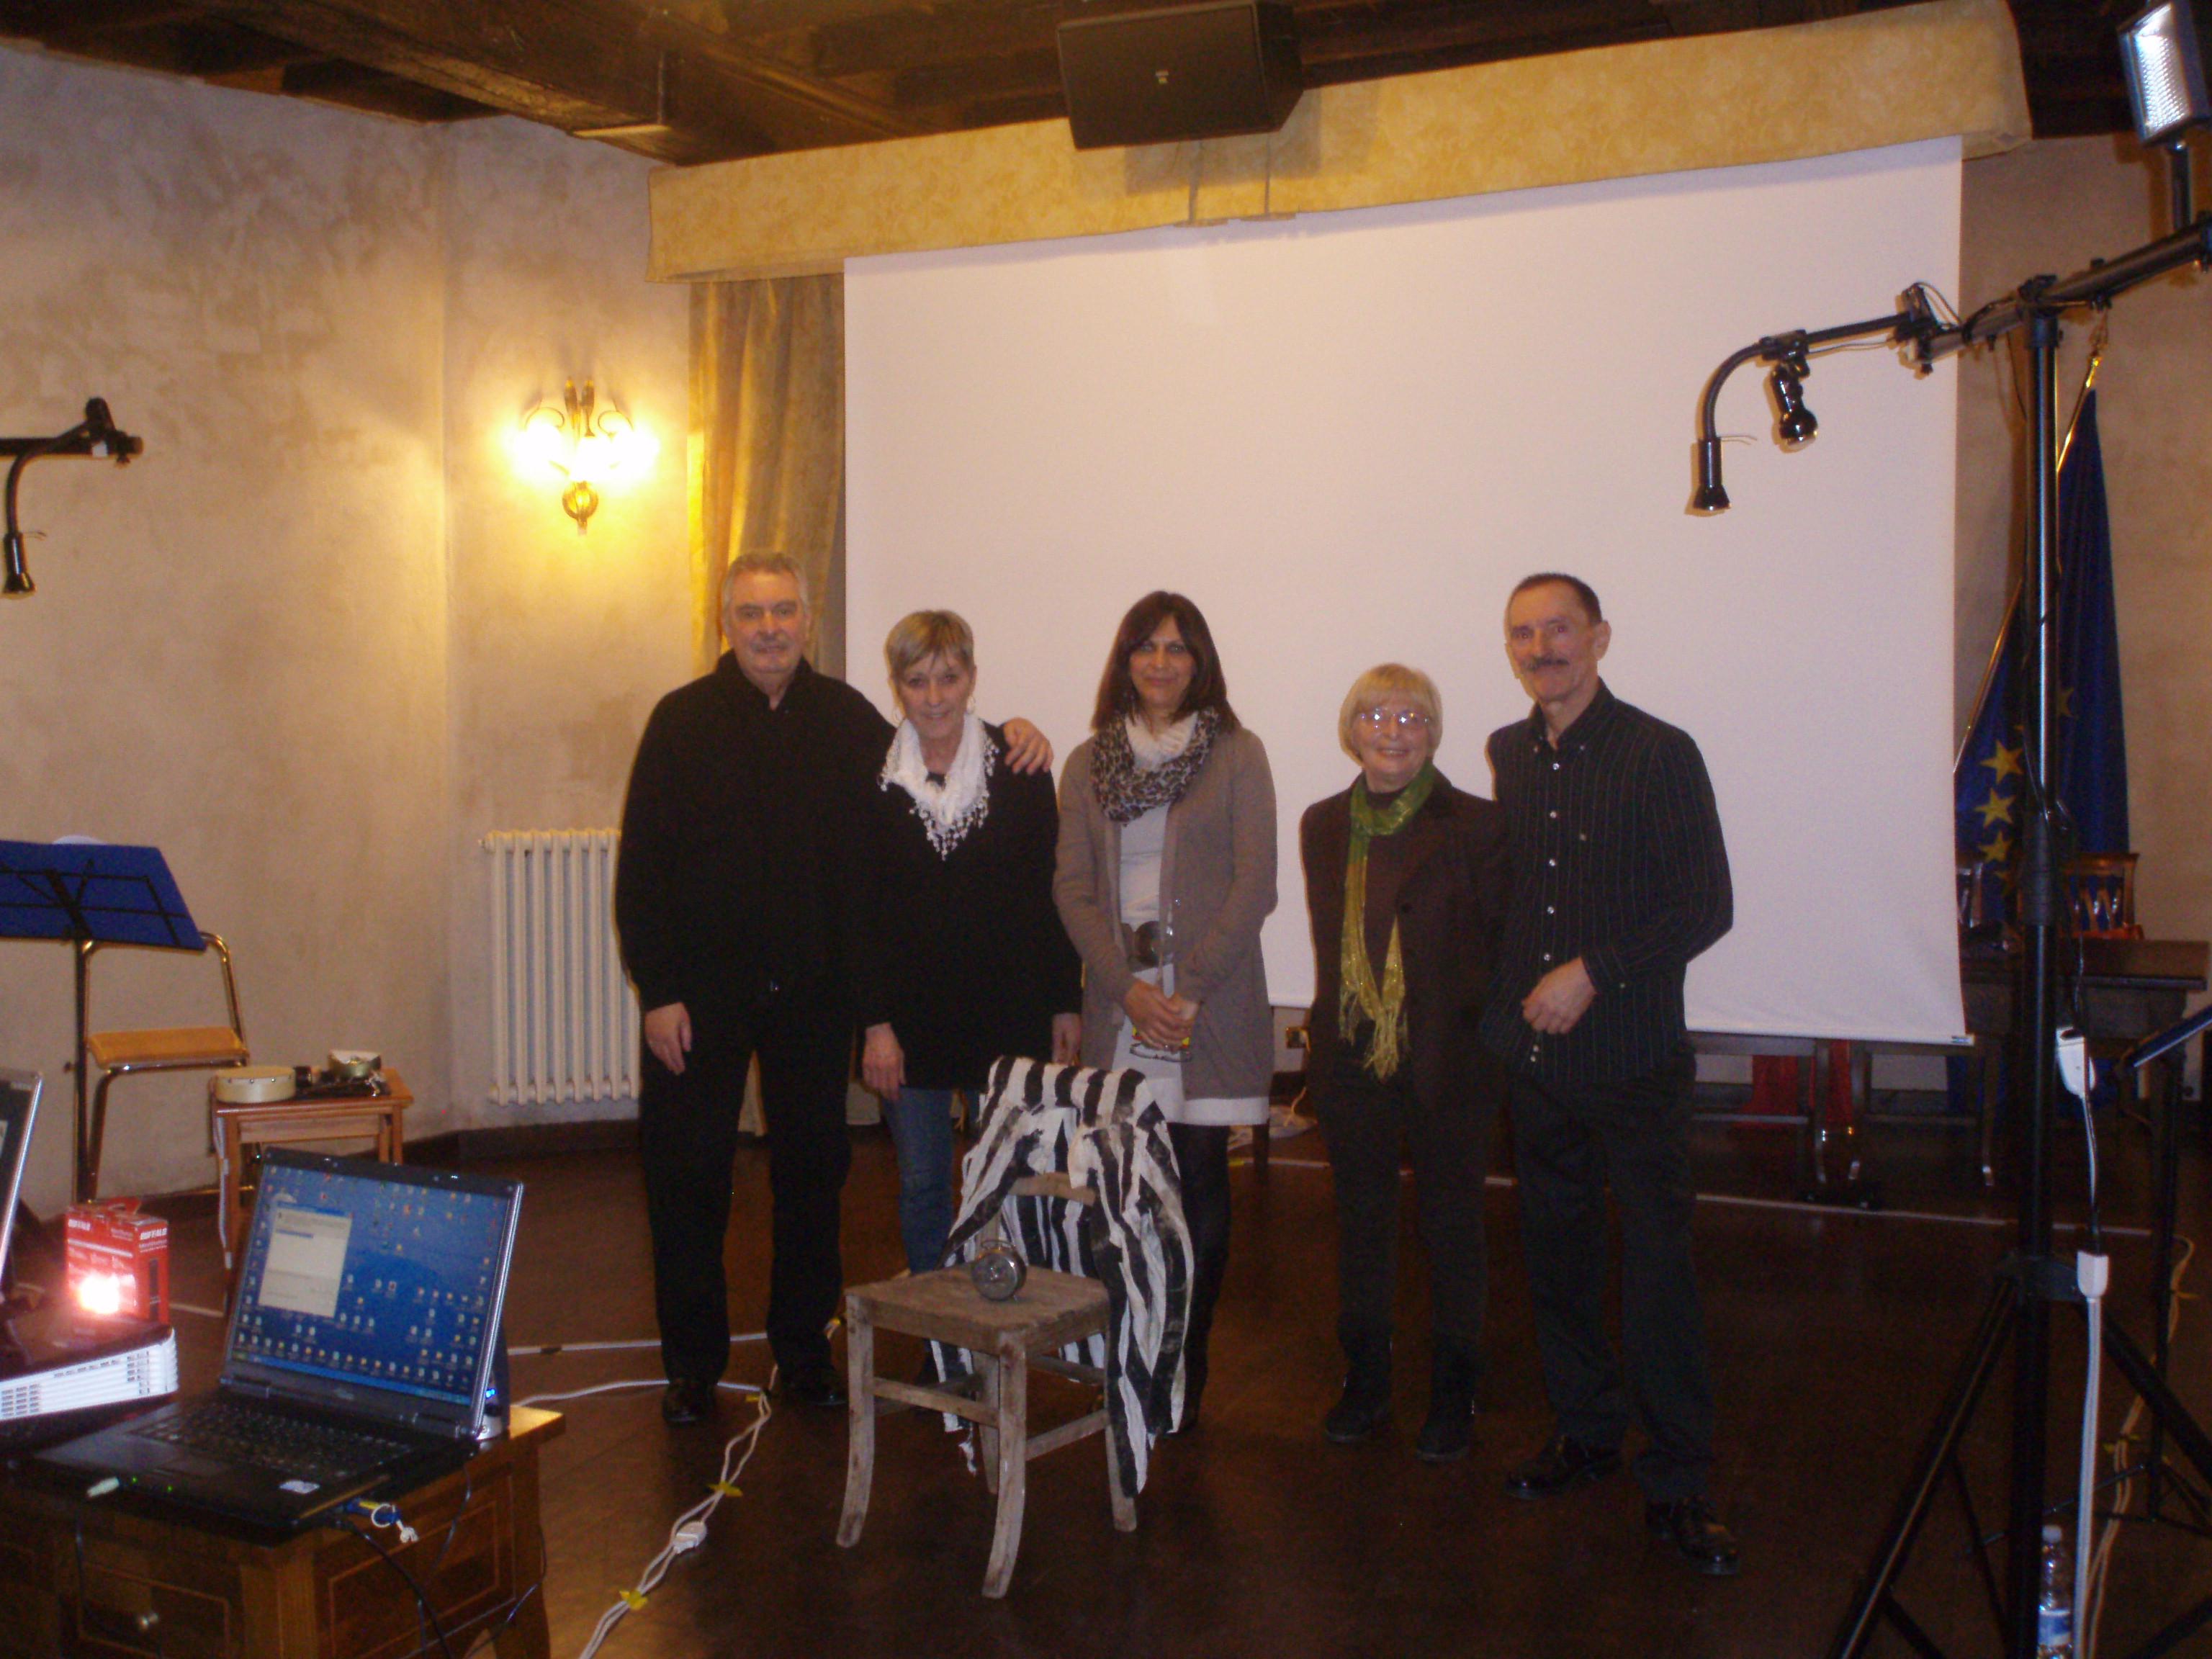 da sx Renzo Bellardone, Yvette Geissbhuler, Aste Stolfa, Maria Lacchio e Umberto Bolzon